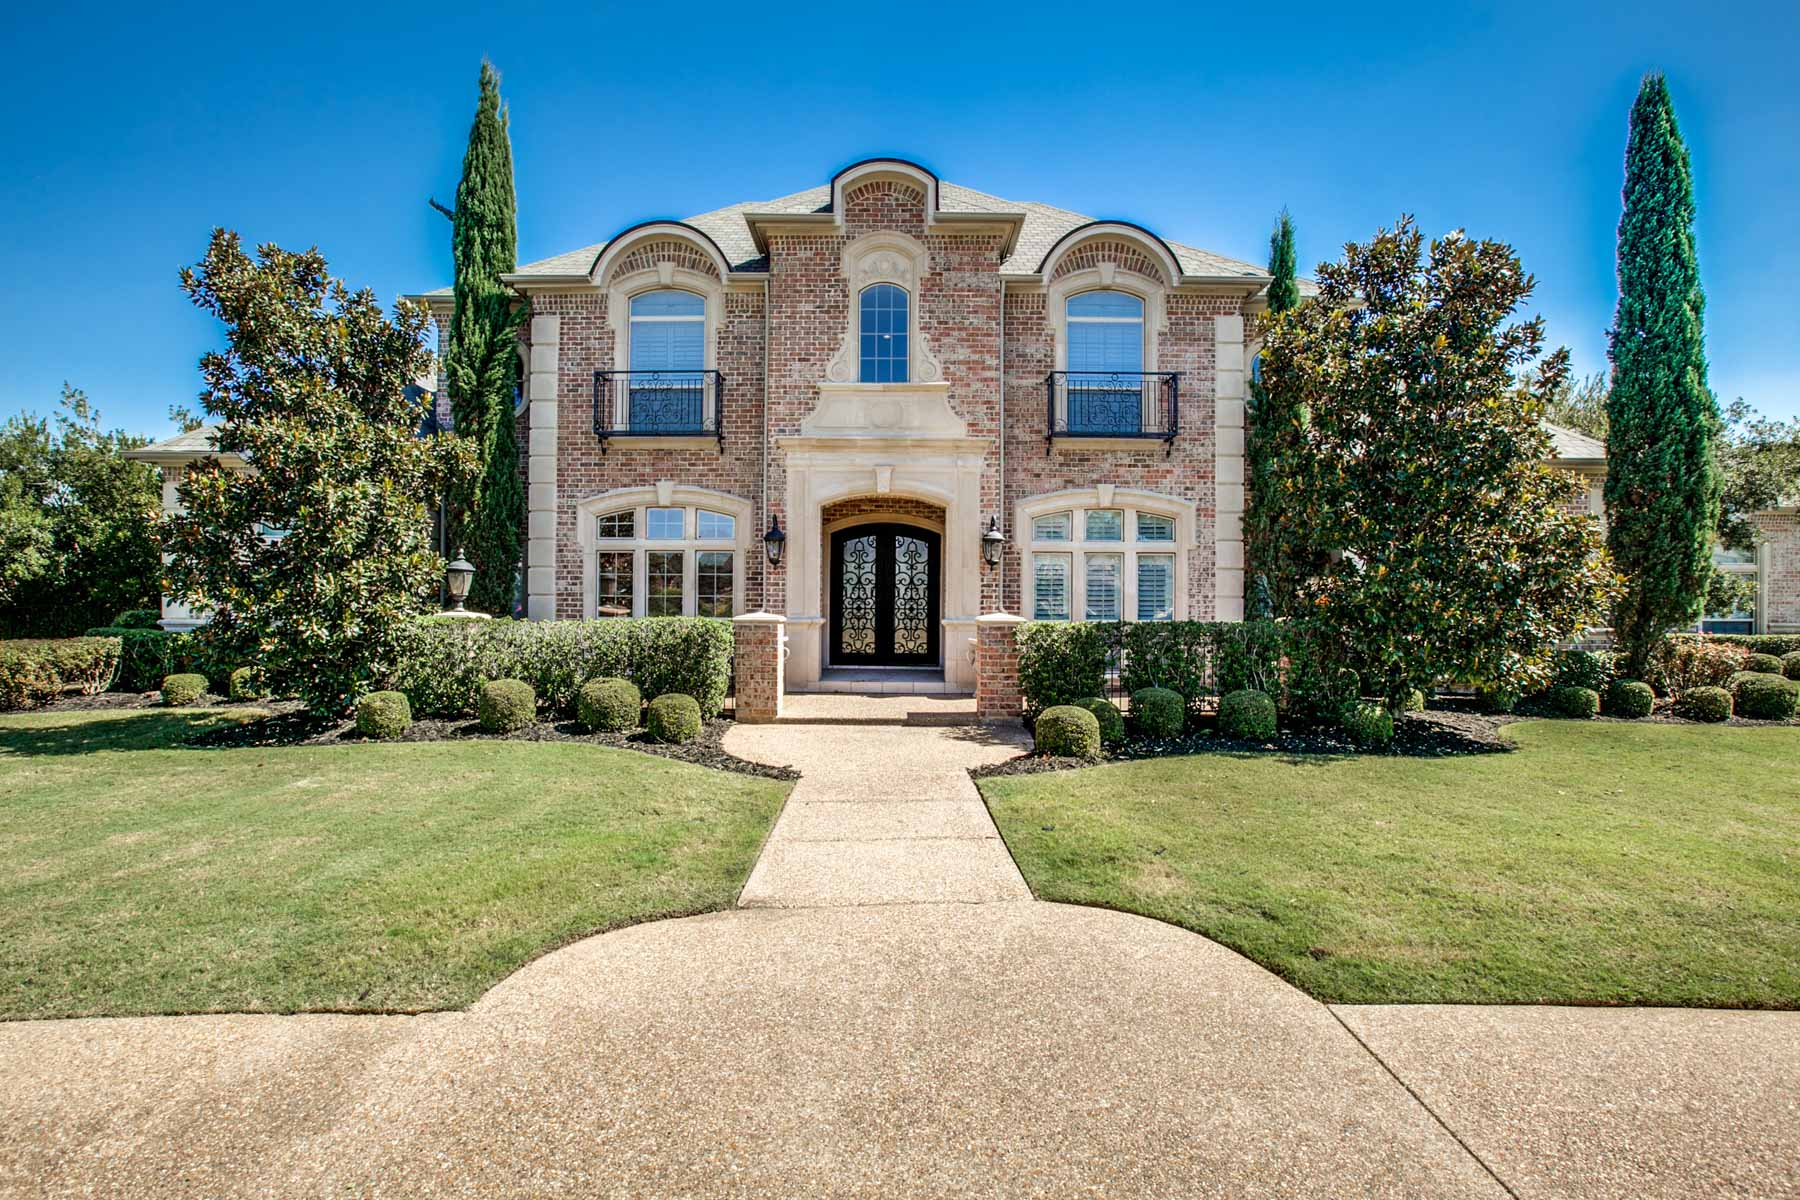 獨棟家庭住宅 為 出售 在 Classic French Chateau 3605 Blossom Park Ct Arlington, 德克薩斯州, 76016 美國